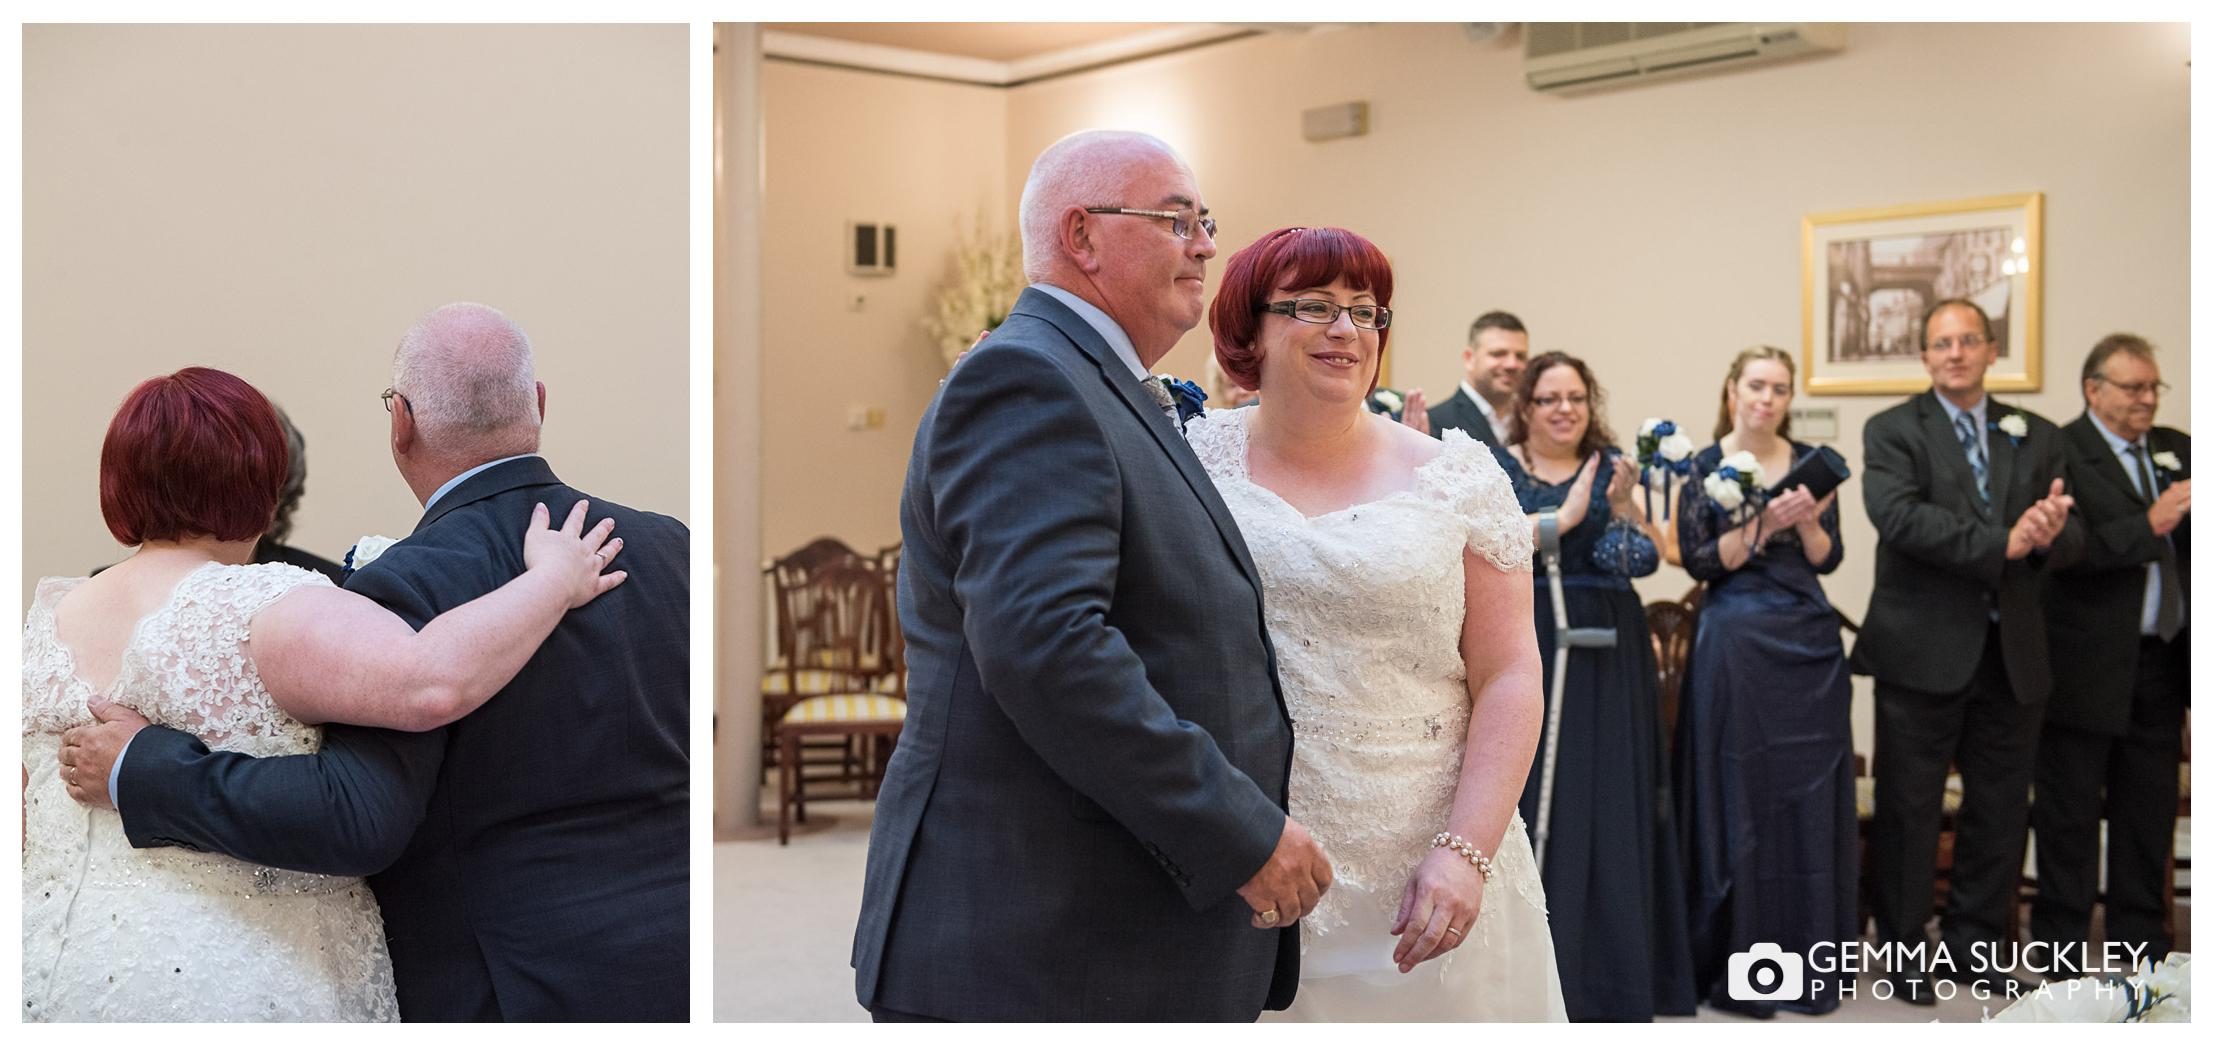 registry-weddings-stockport©gemmasuckleyphotography-.jpg